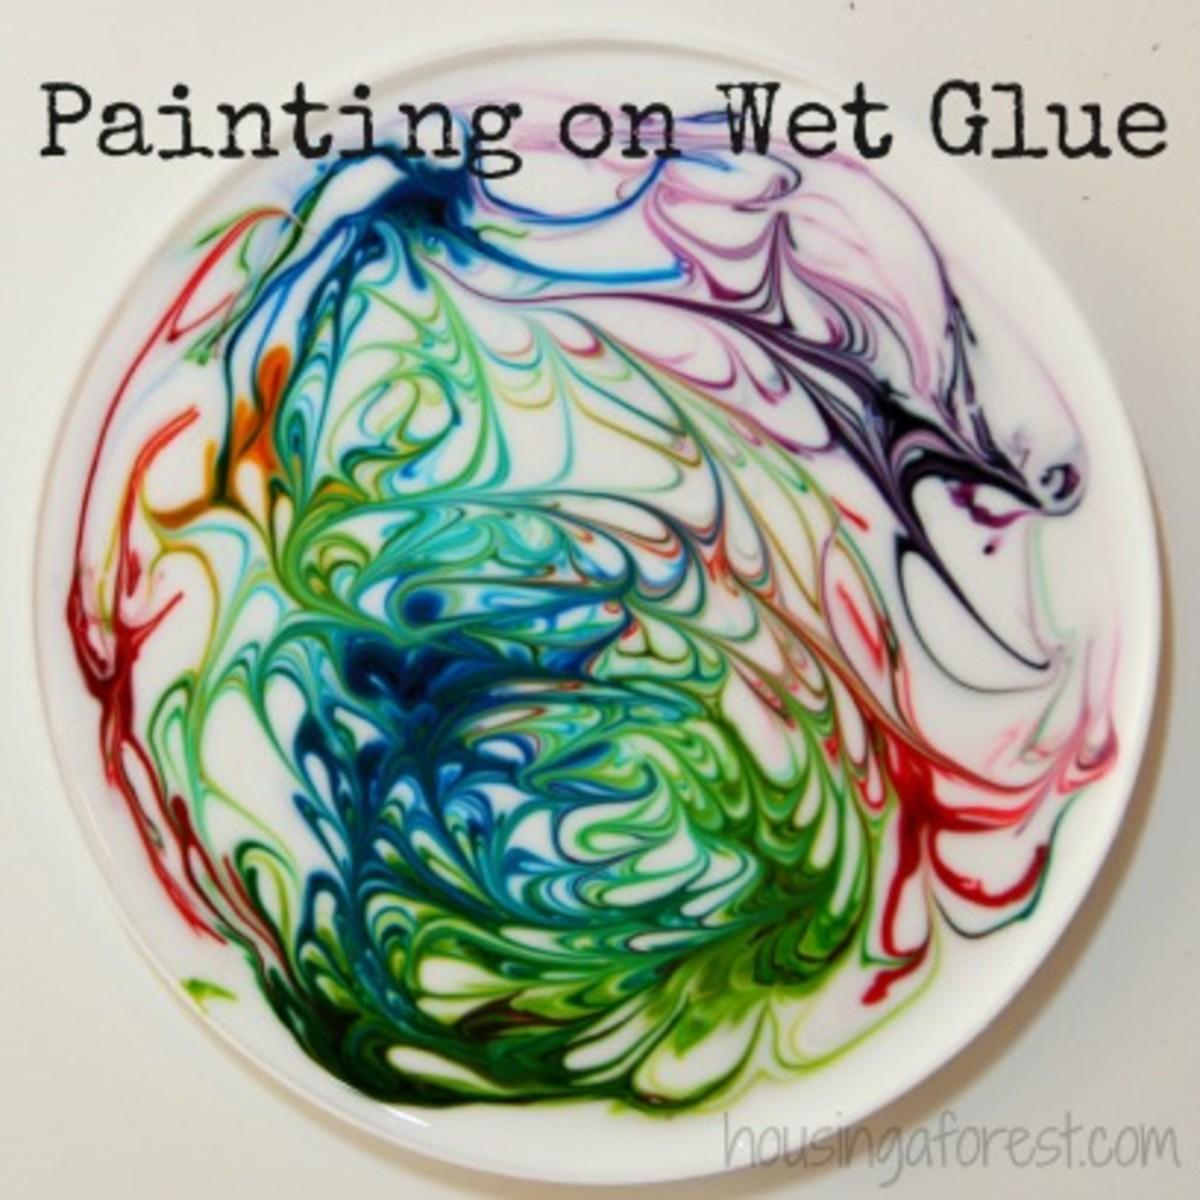 Painting-On-Wet-Glue-sun-catcher